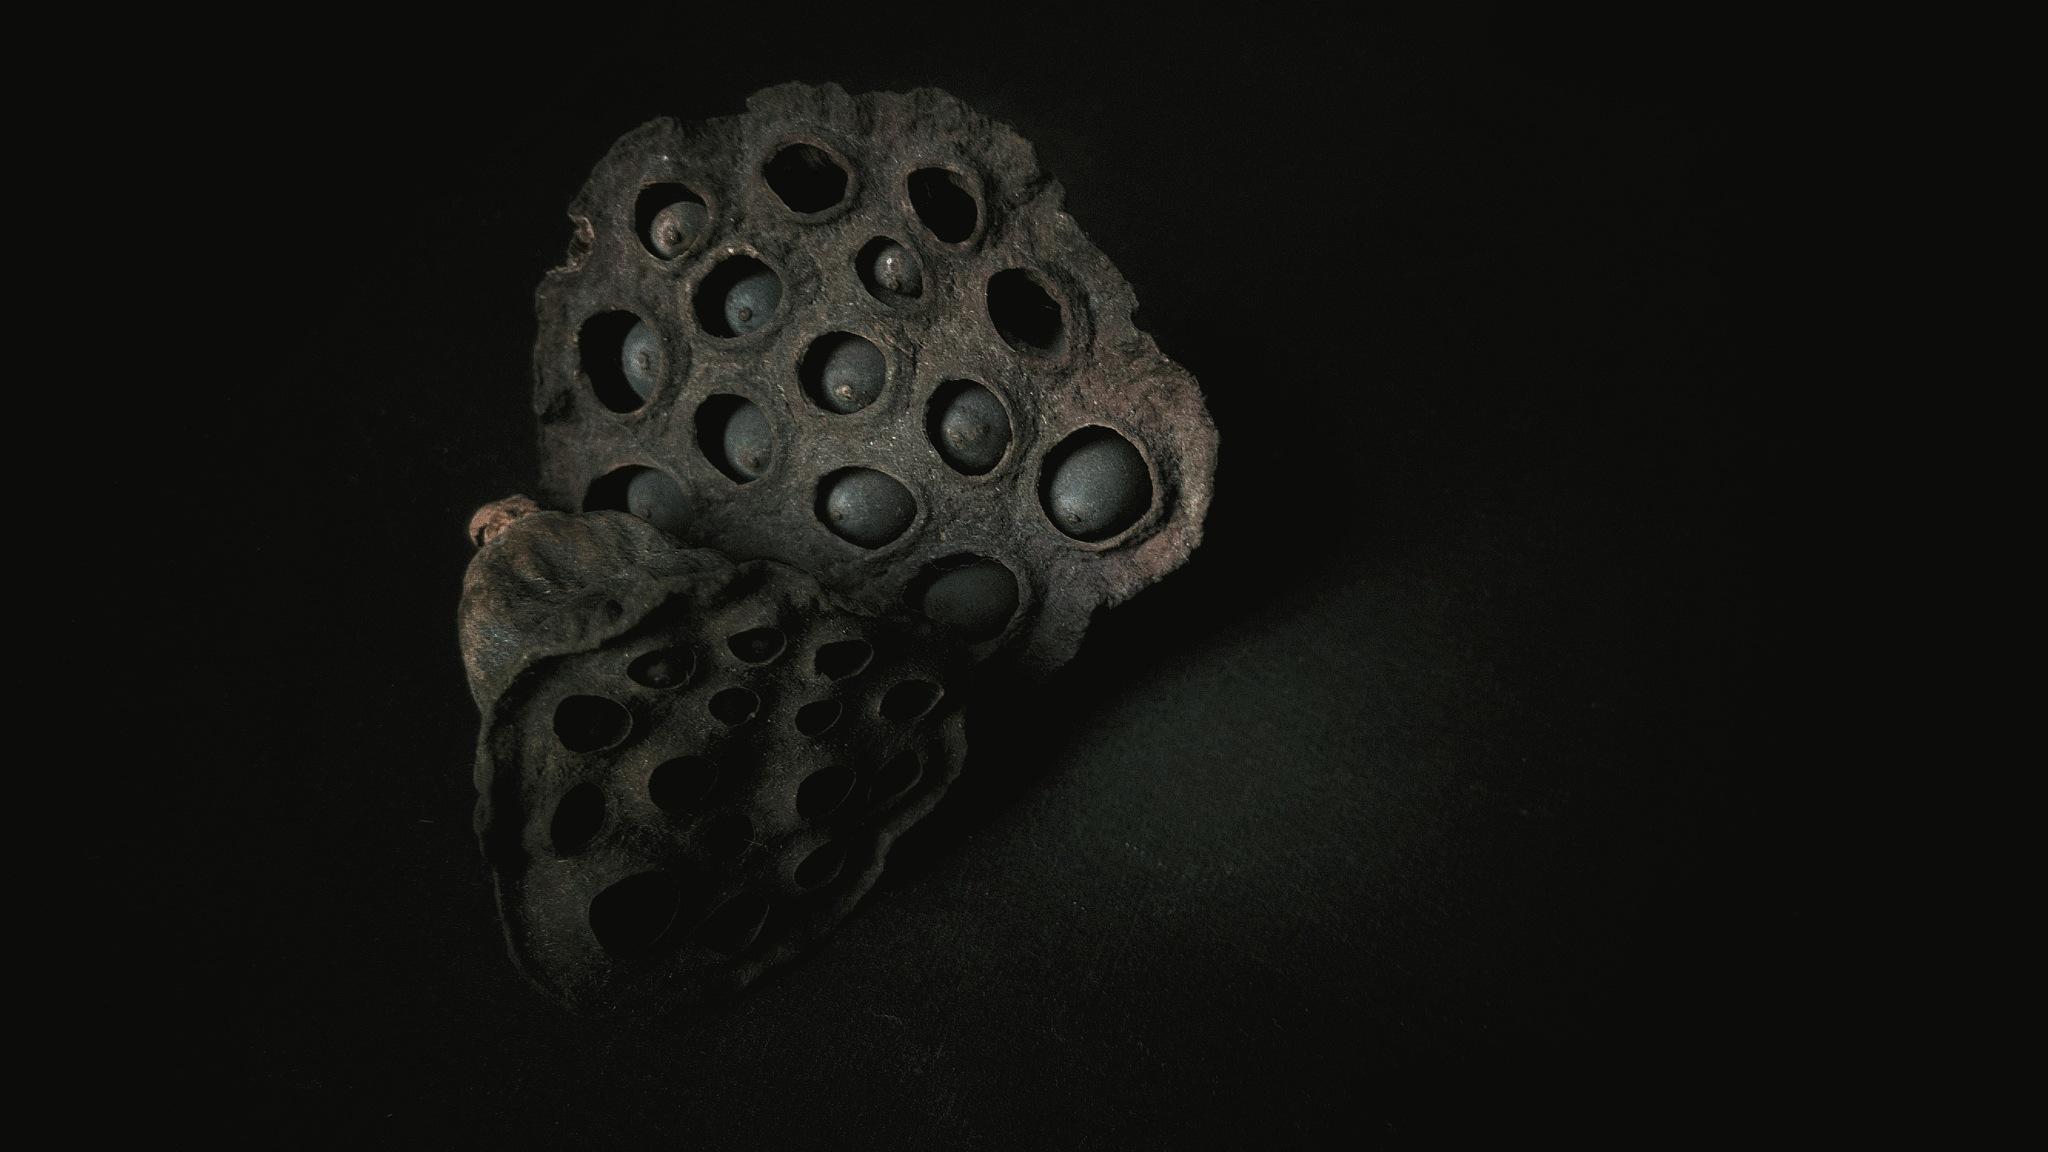 trapped seeds by Ludmila Kozinkova